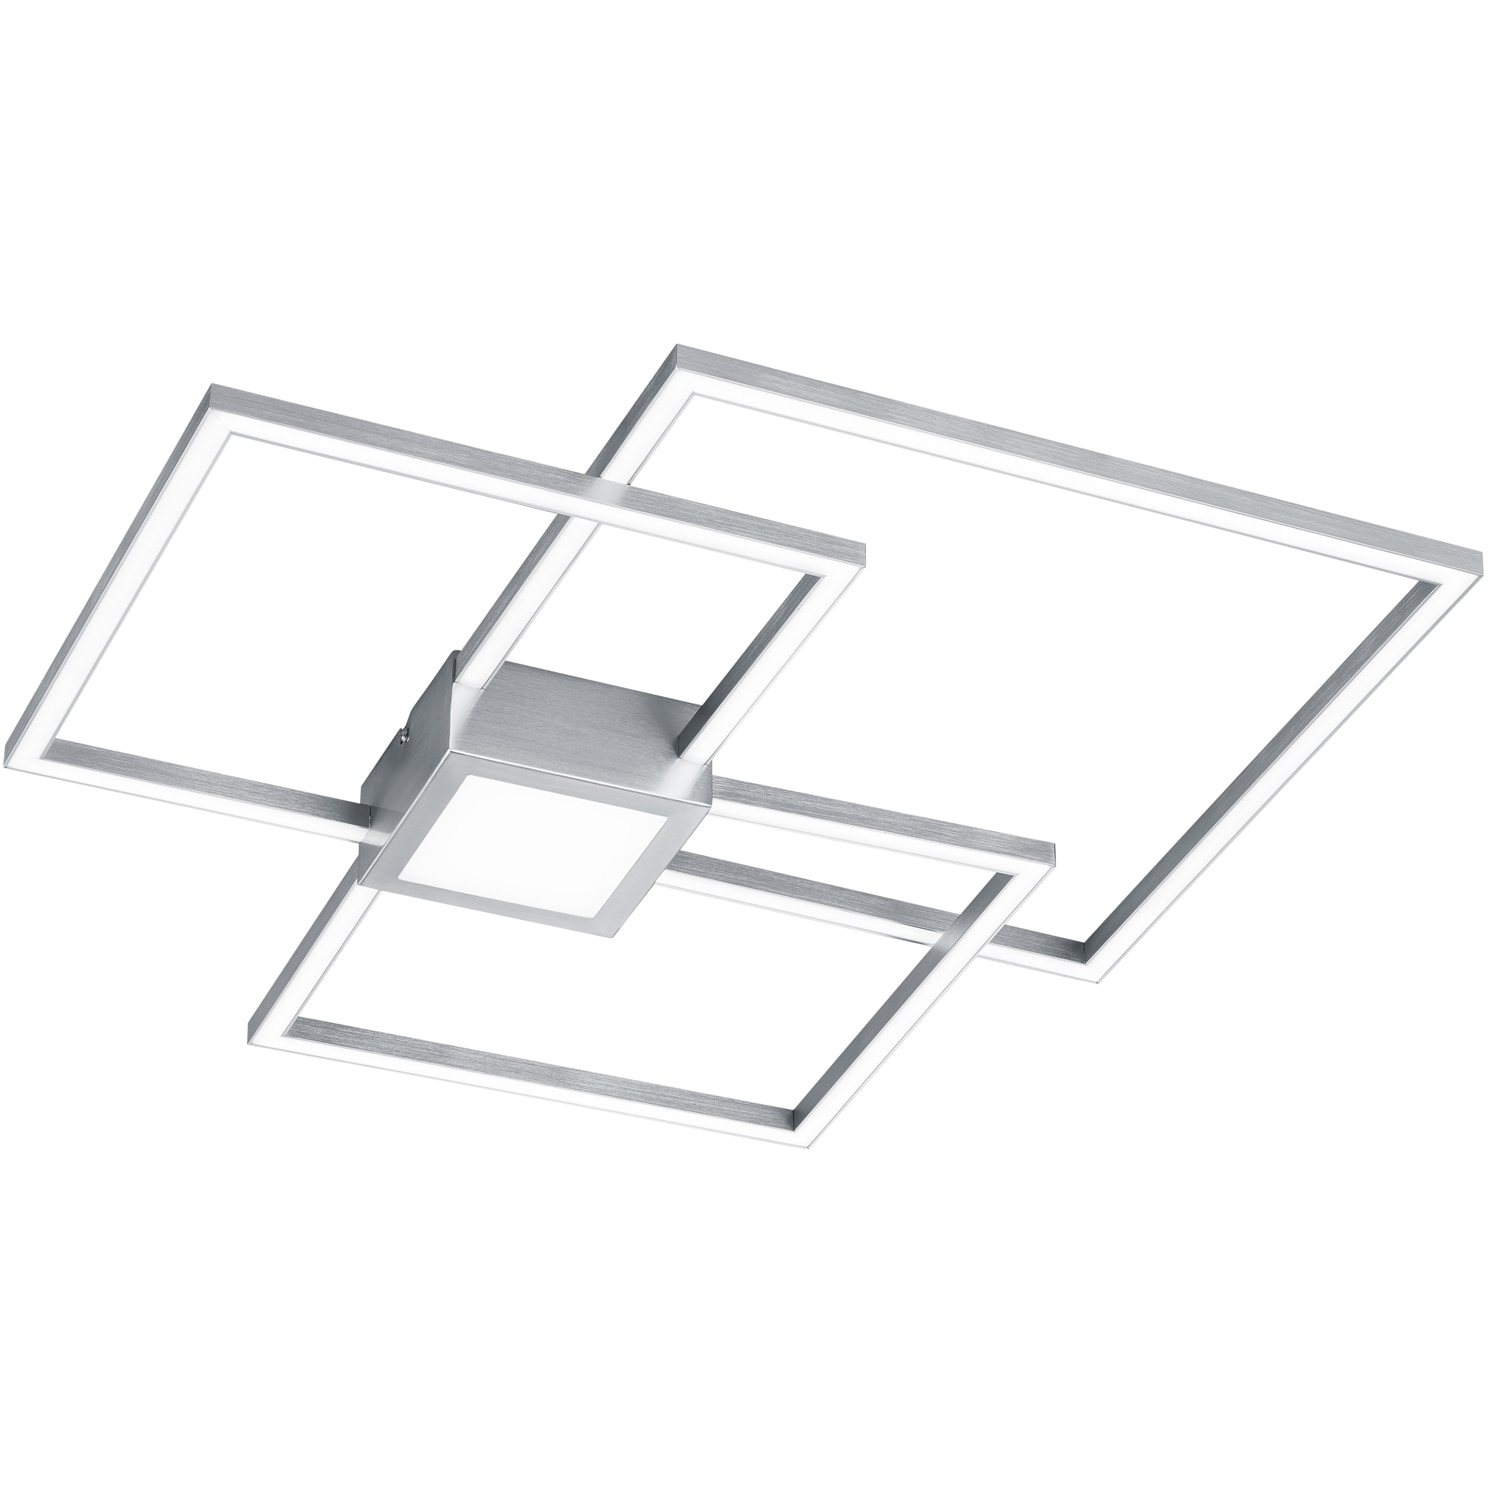 Fotografie Lustra LED integrat Trio Hydra Square, tip plafoniera, cu intrerupator dimmer, 38W, 4000 lm, 3000K, IP20, metal, Nichel mat